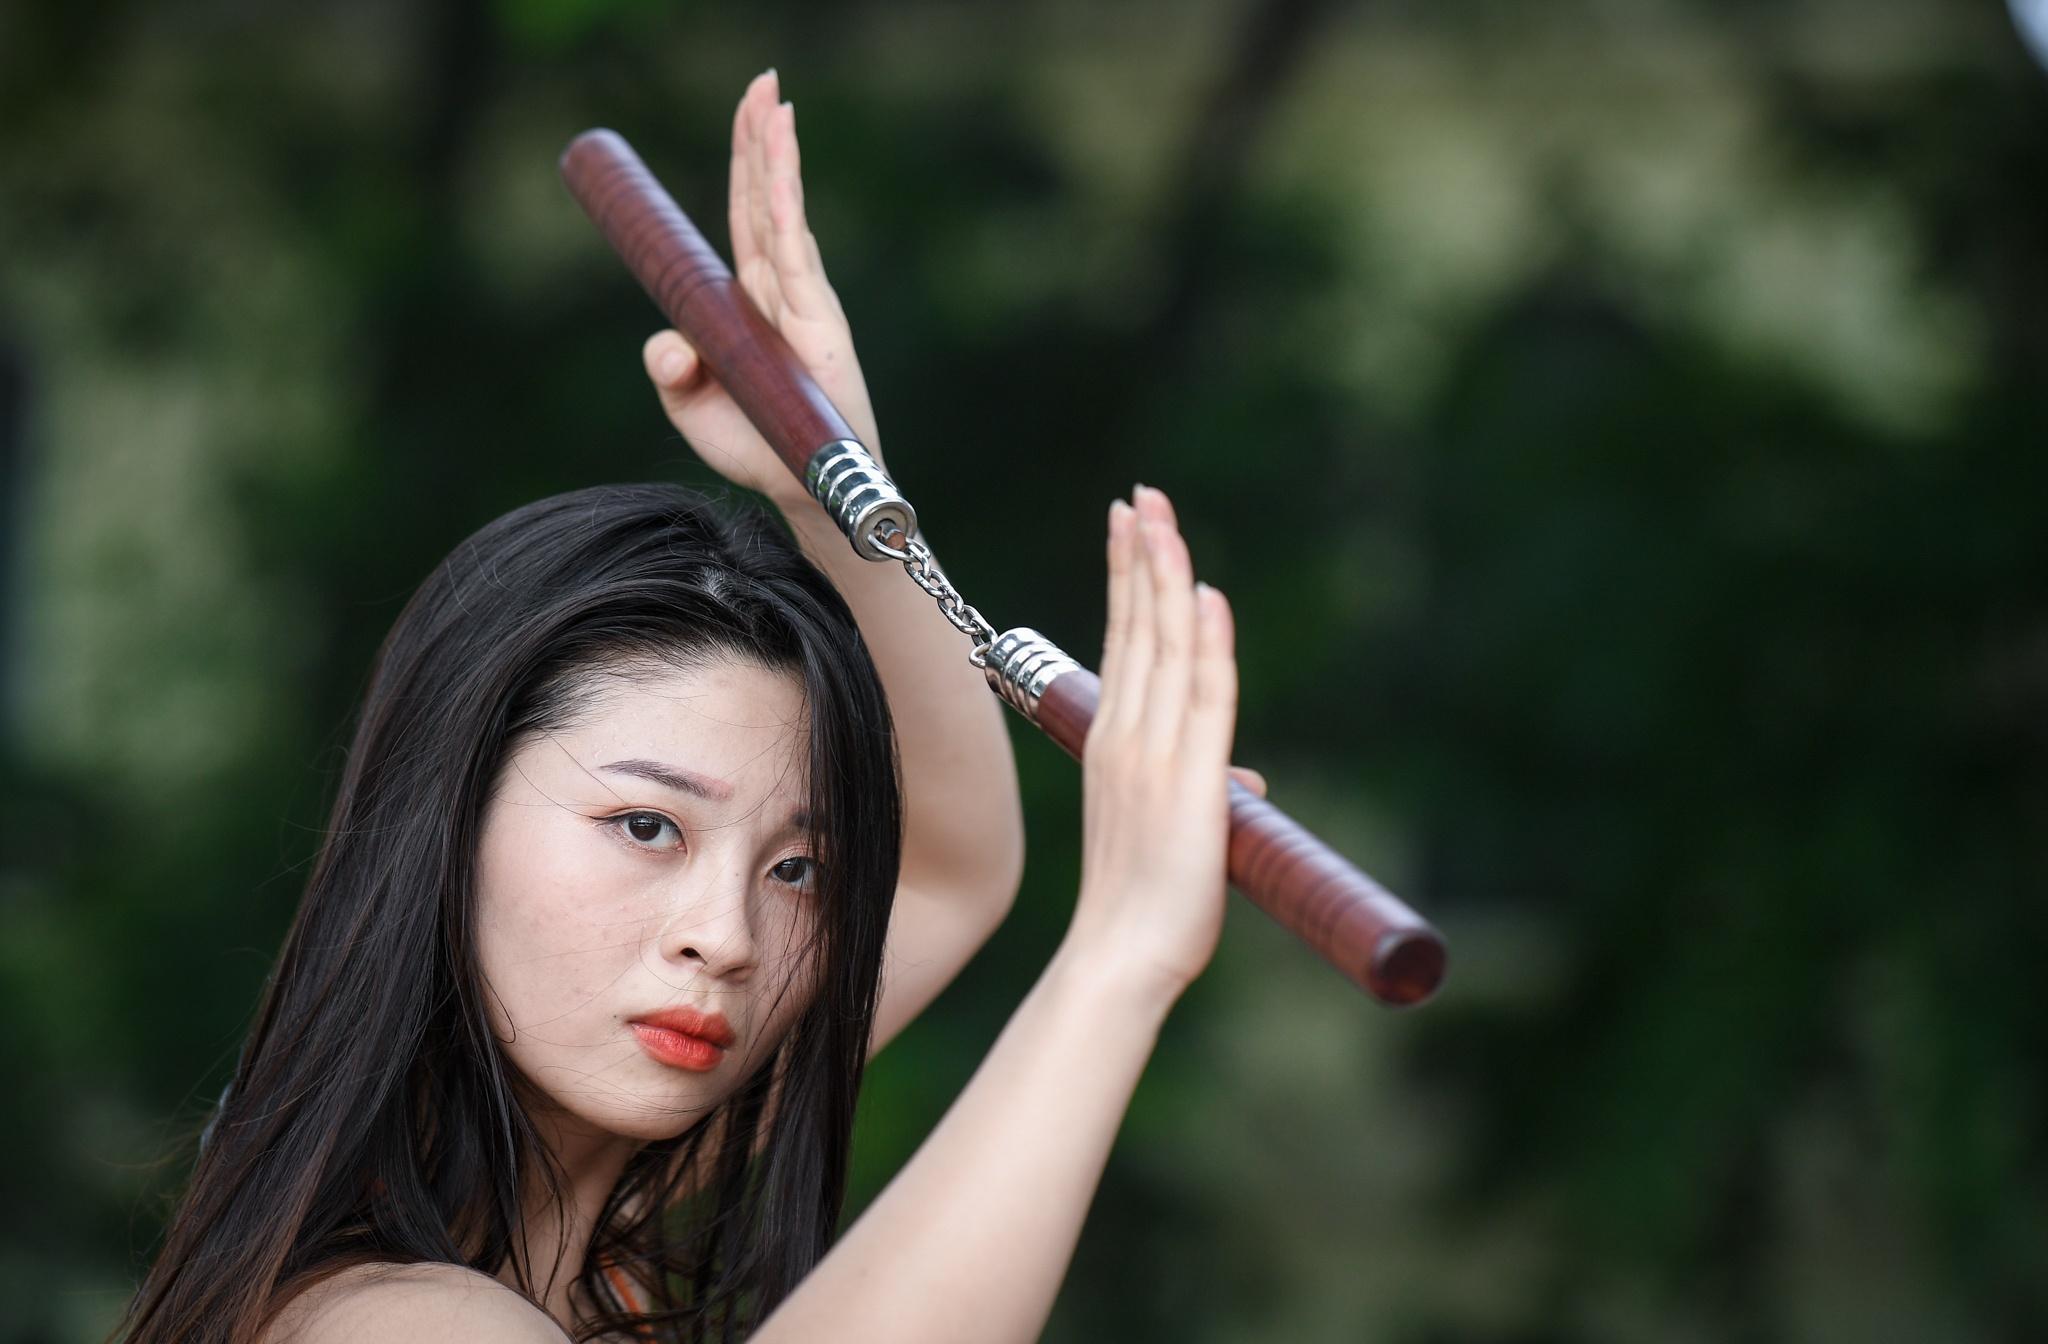 Hot girl mua con so khong ai yeu vi qua manh me hinh anh 2 3_hot_girl_mua_con_zing24.jpg